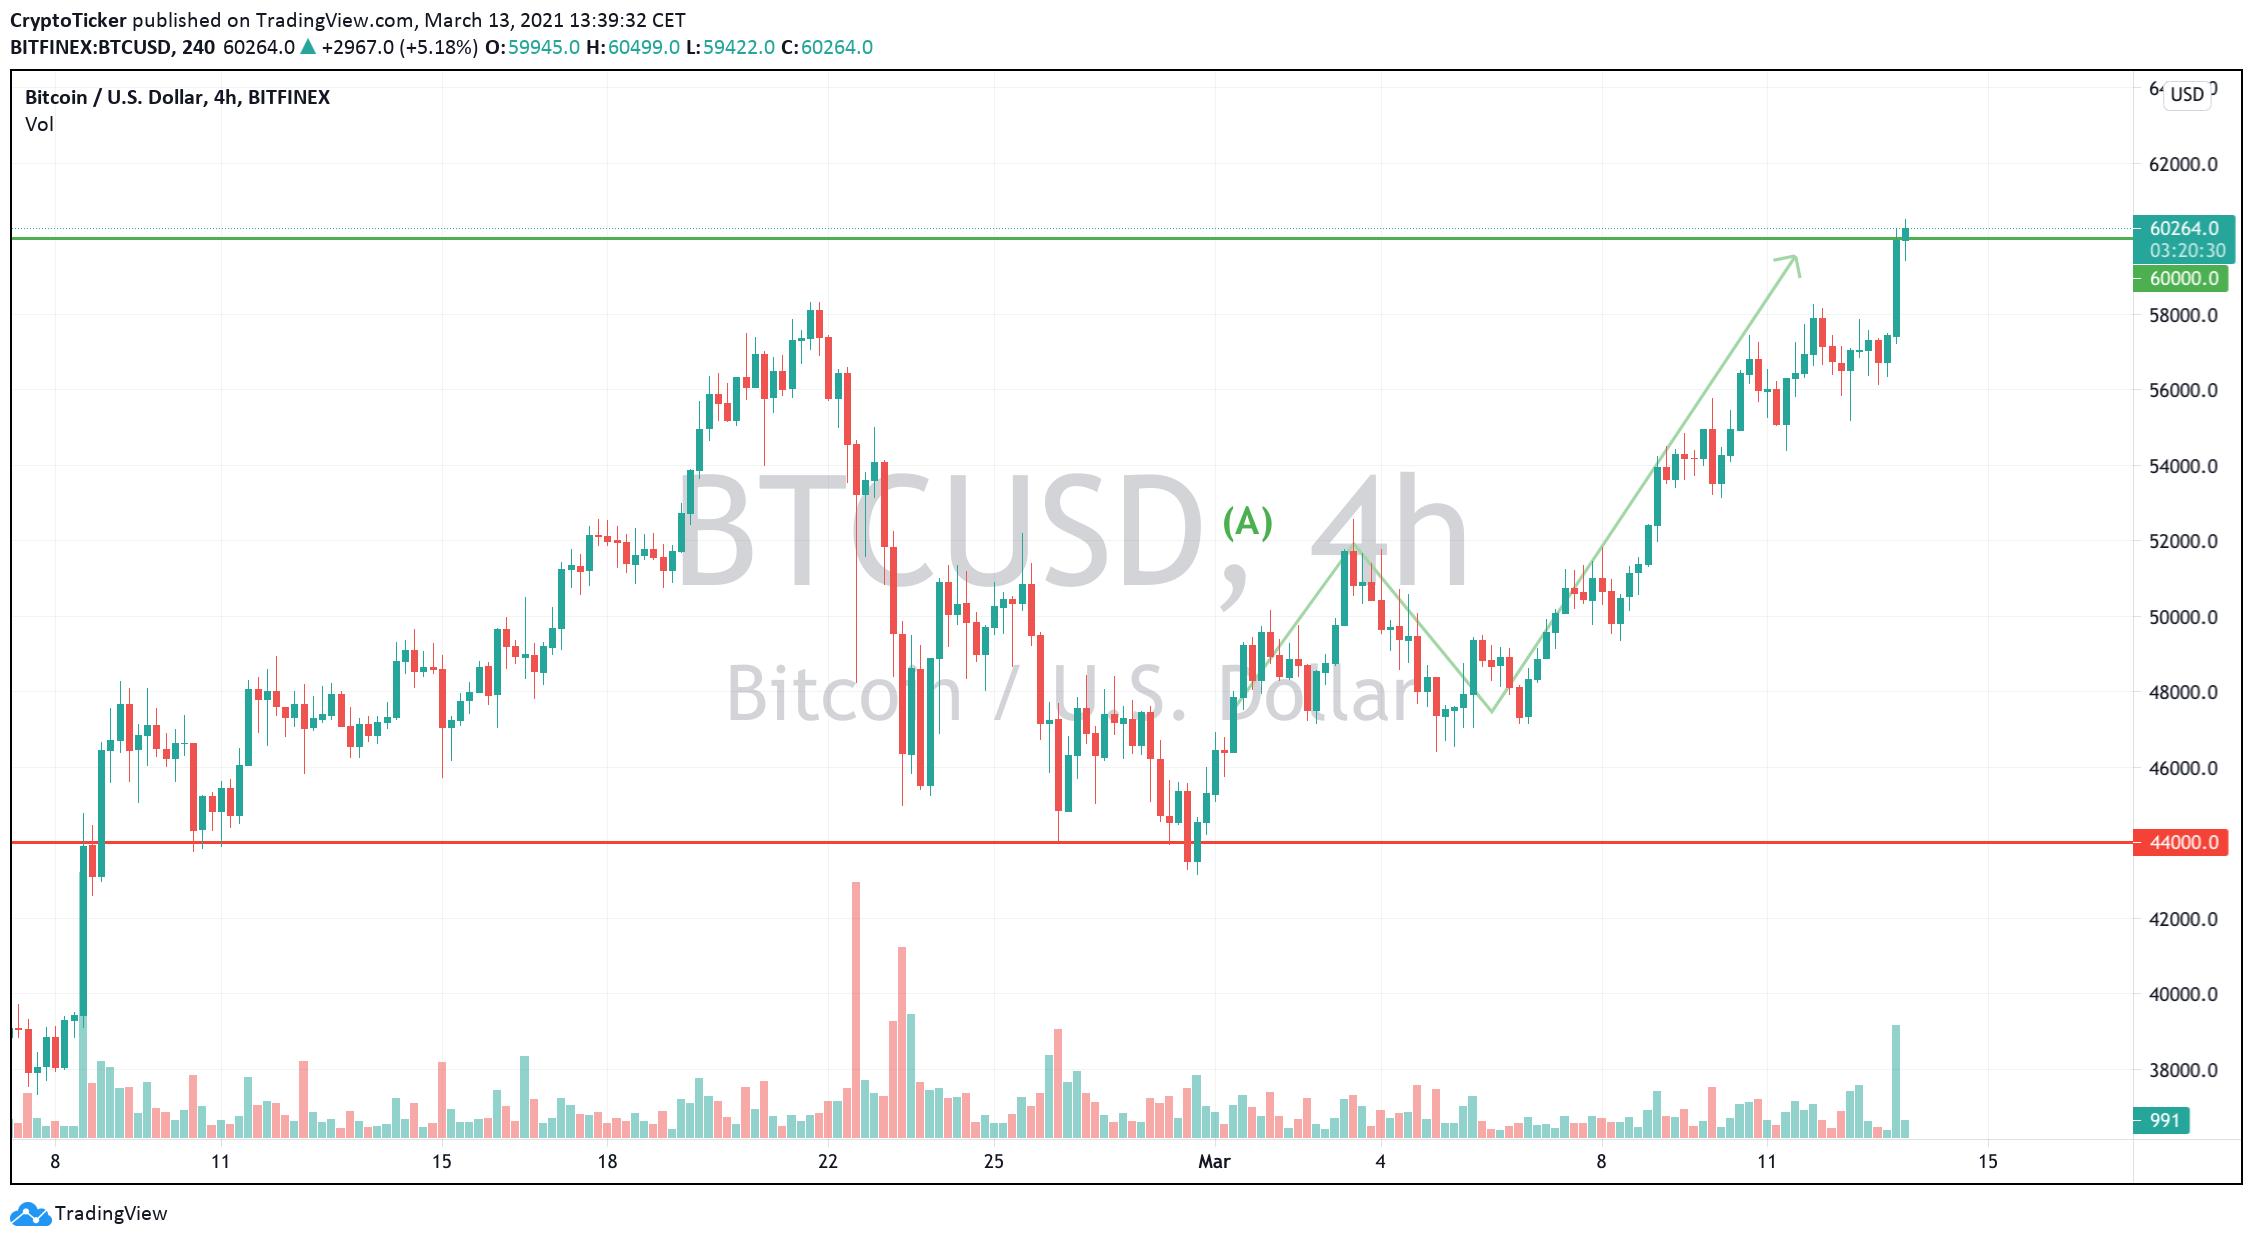 BTC/USD 4-hours chart showing BTC reach 60K.